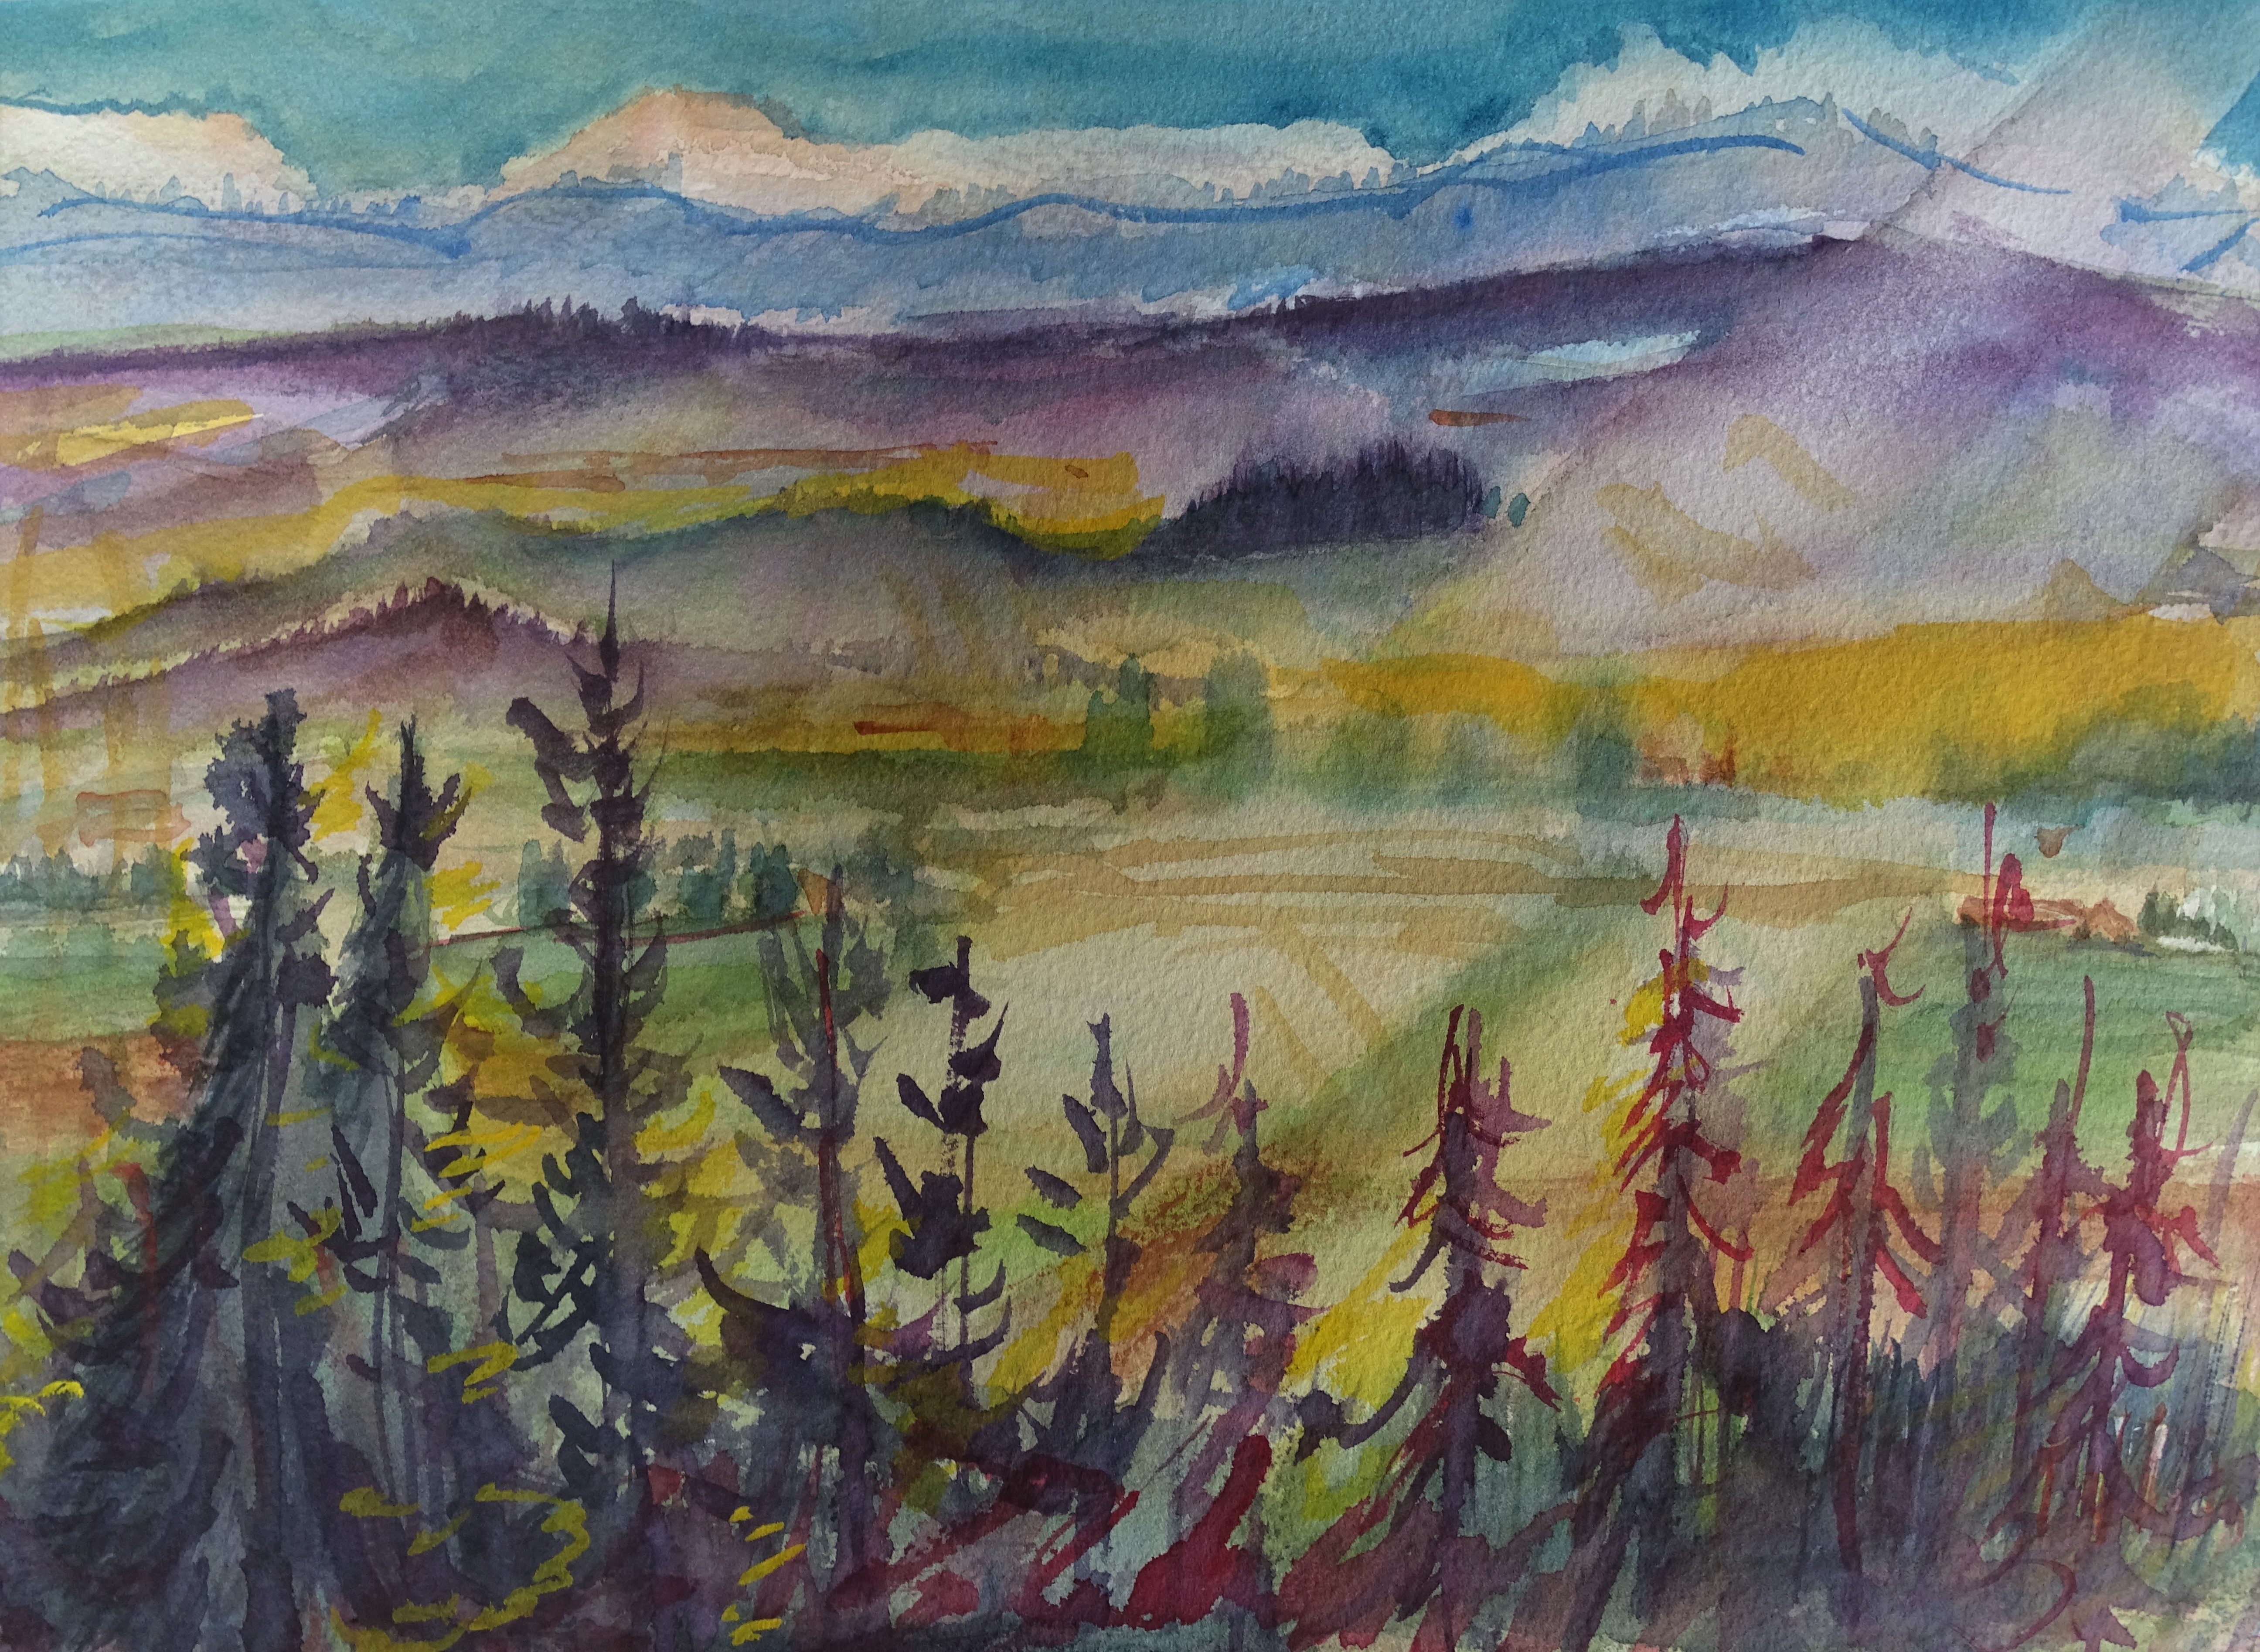 Herbst-Aquarelle-Bad-Birnbach-Nadia-baumgart